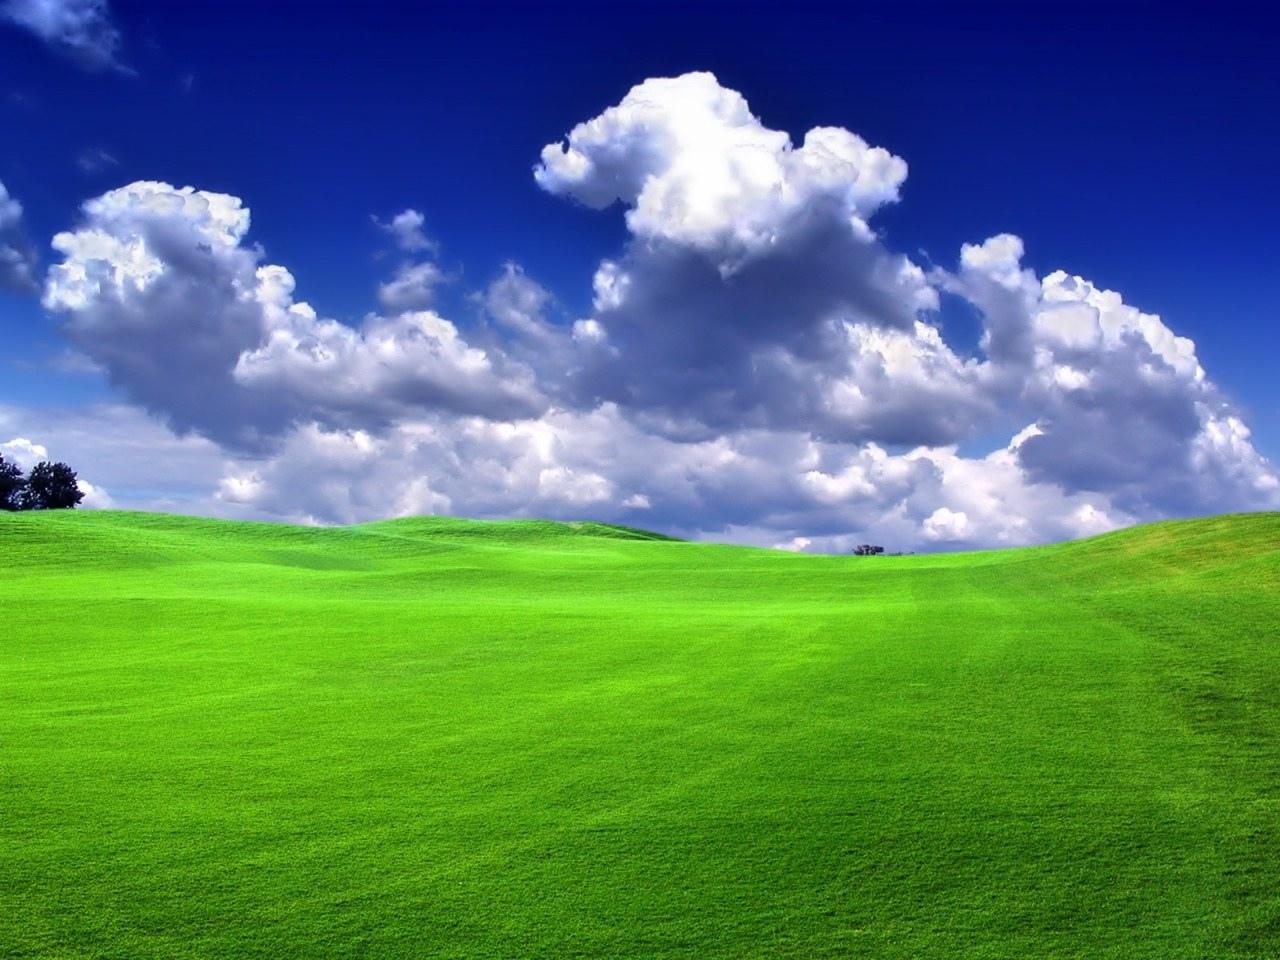 http://3.bp.blogspot.com/-htQW1dZWON4/TZ2Iq-LgImI/AAAAAAAAA18/JGNvfymjYcg/s1600/green_grass1.jpg